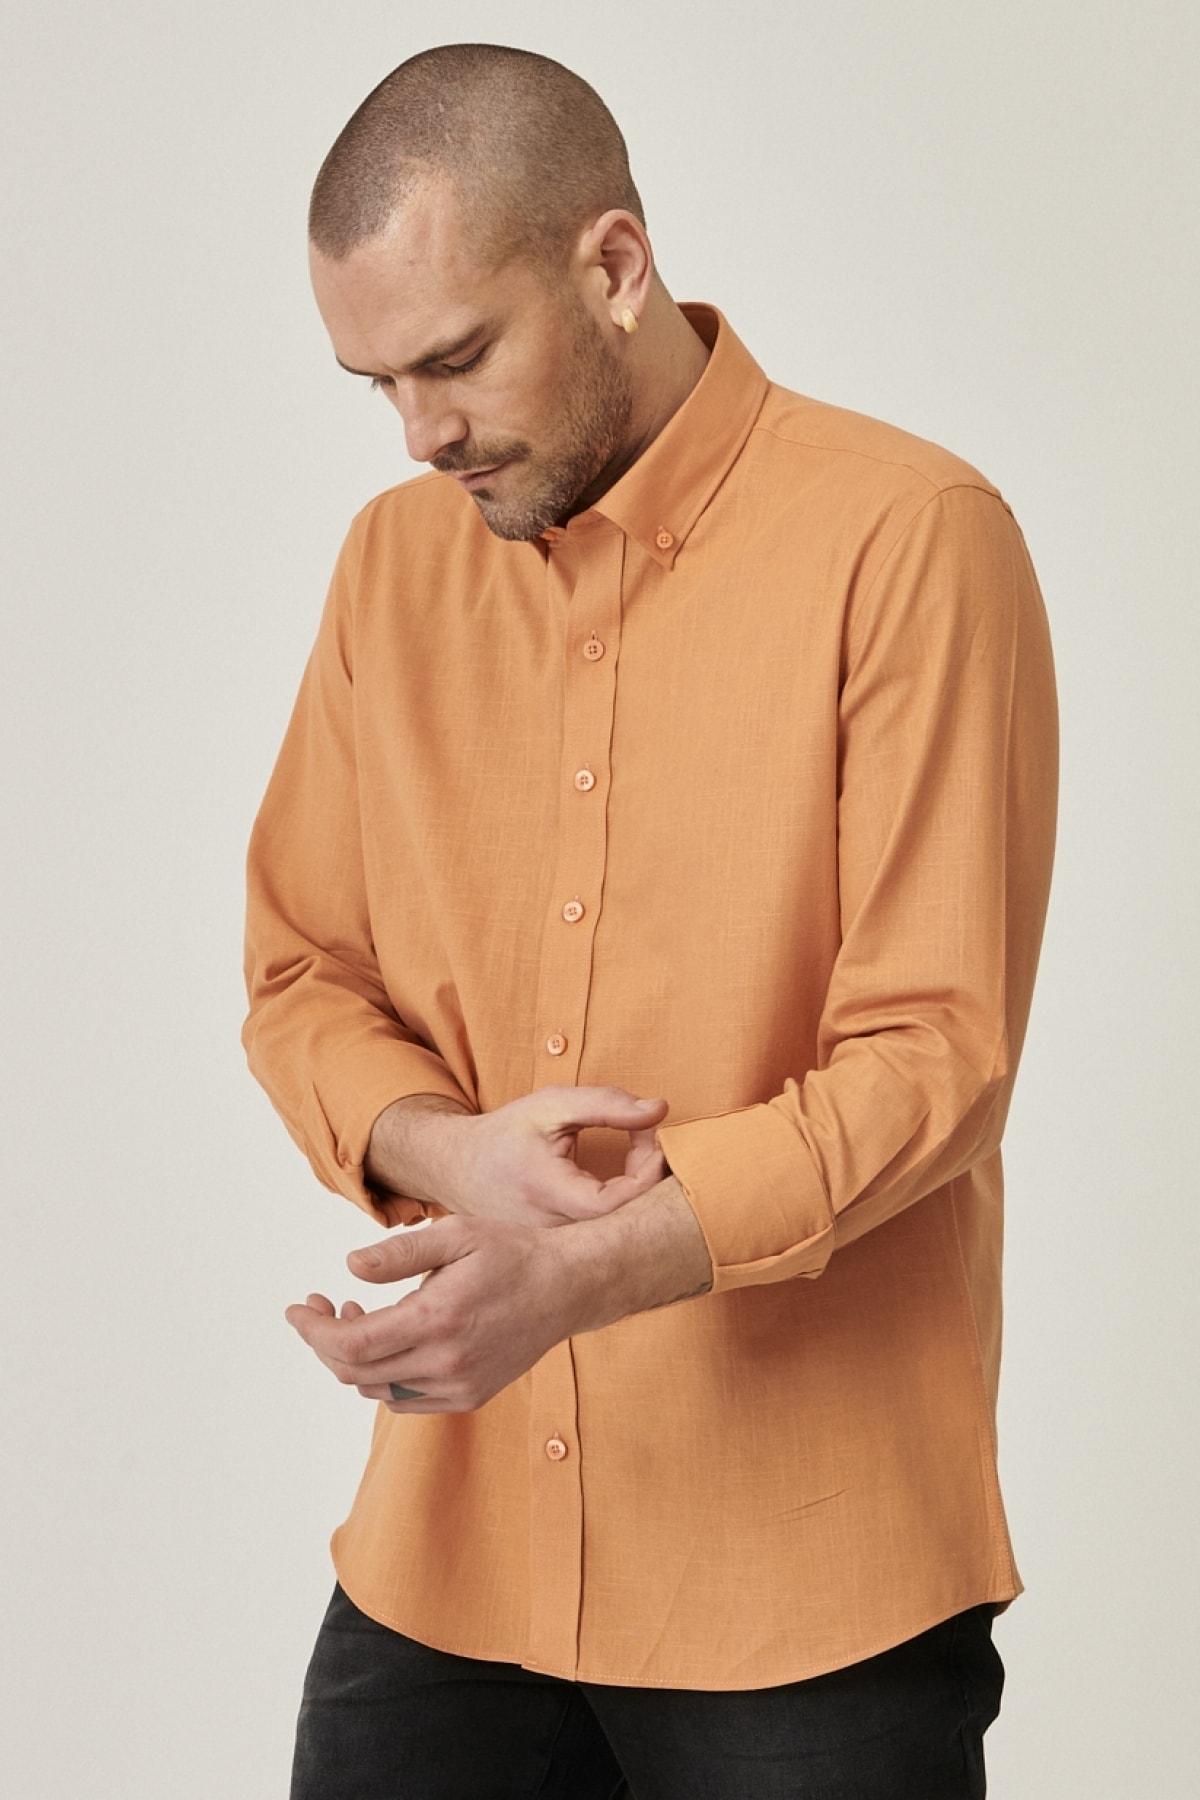 Erkek Kiremit Tailored Slim Fit Dar Kesim Düğmeli Yaka %100 Koton Gömlek